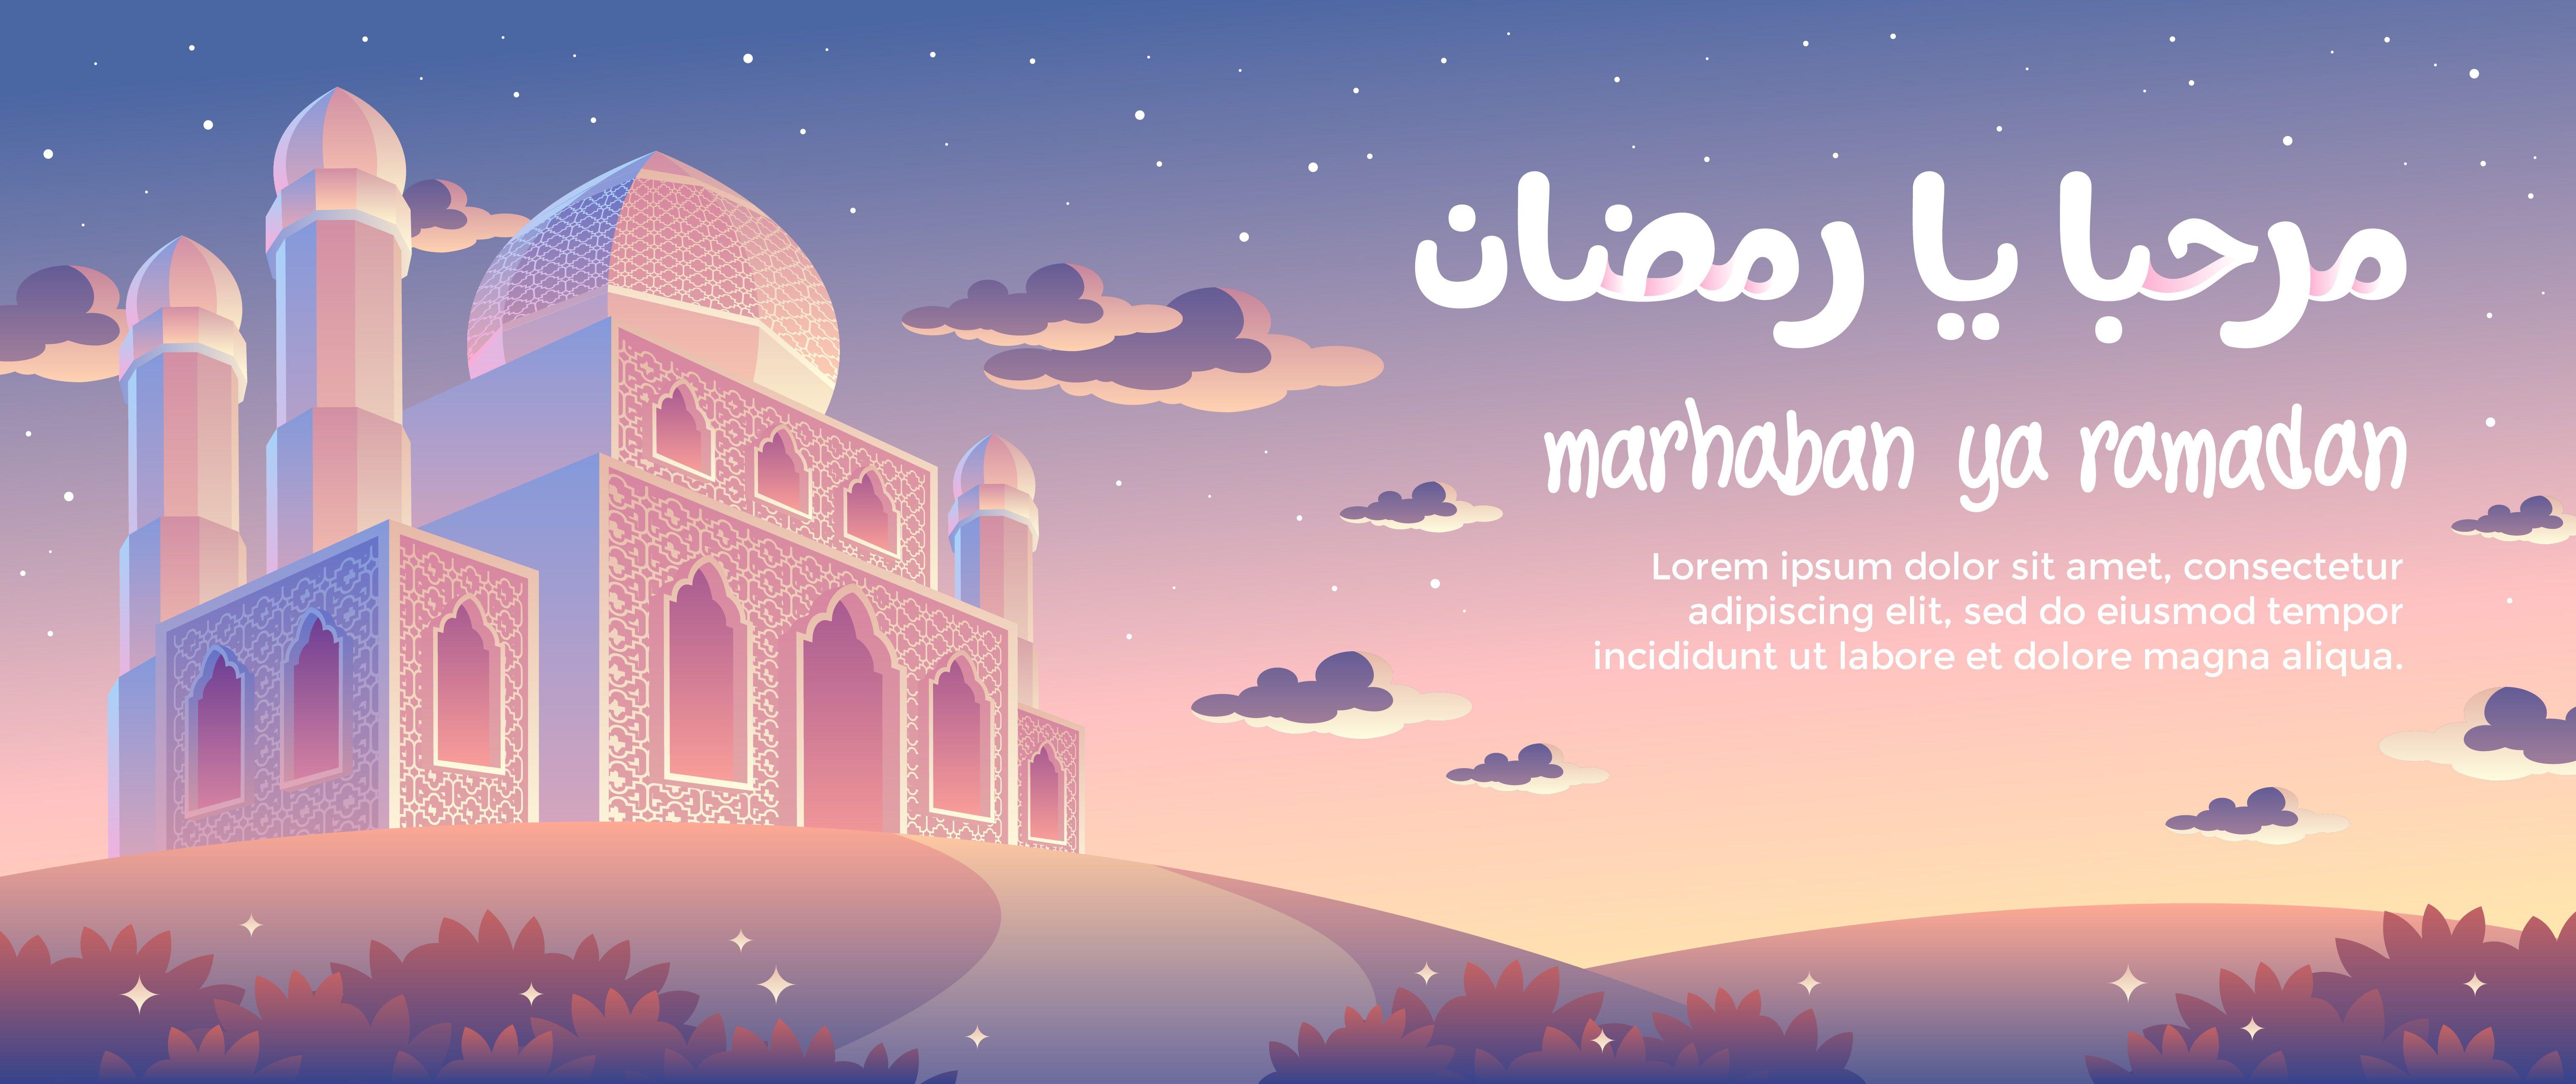 Sunset In The Evening Of Marhaban Ya Ramadan Greeting Card Ramadan Greetings Ramadan Islamic Posters